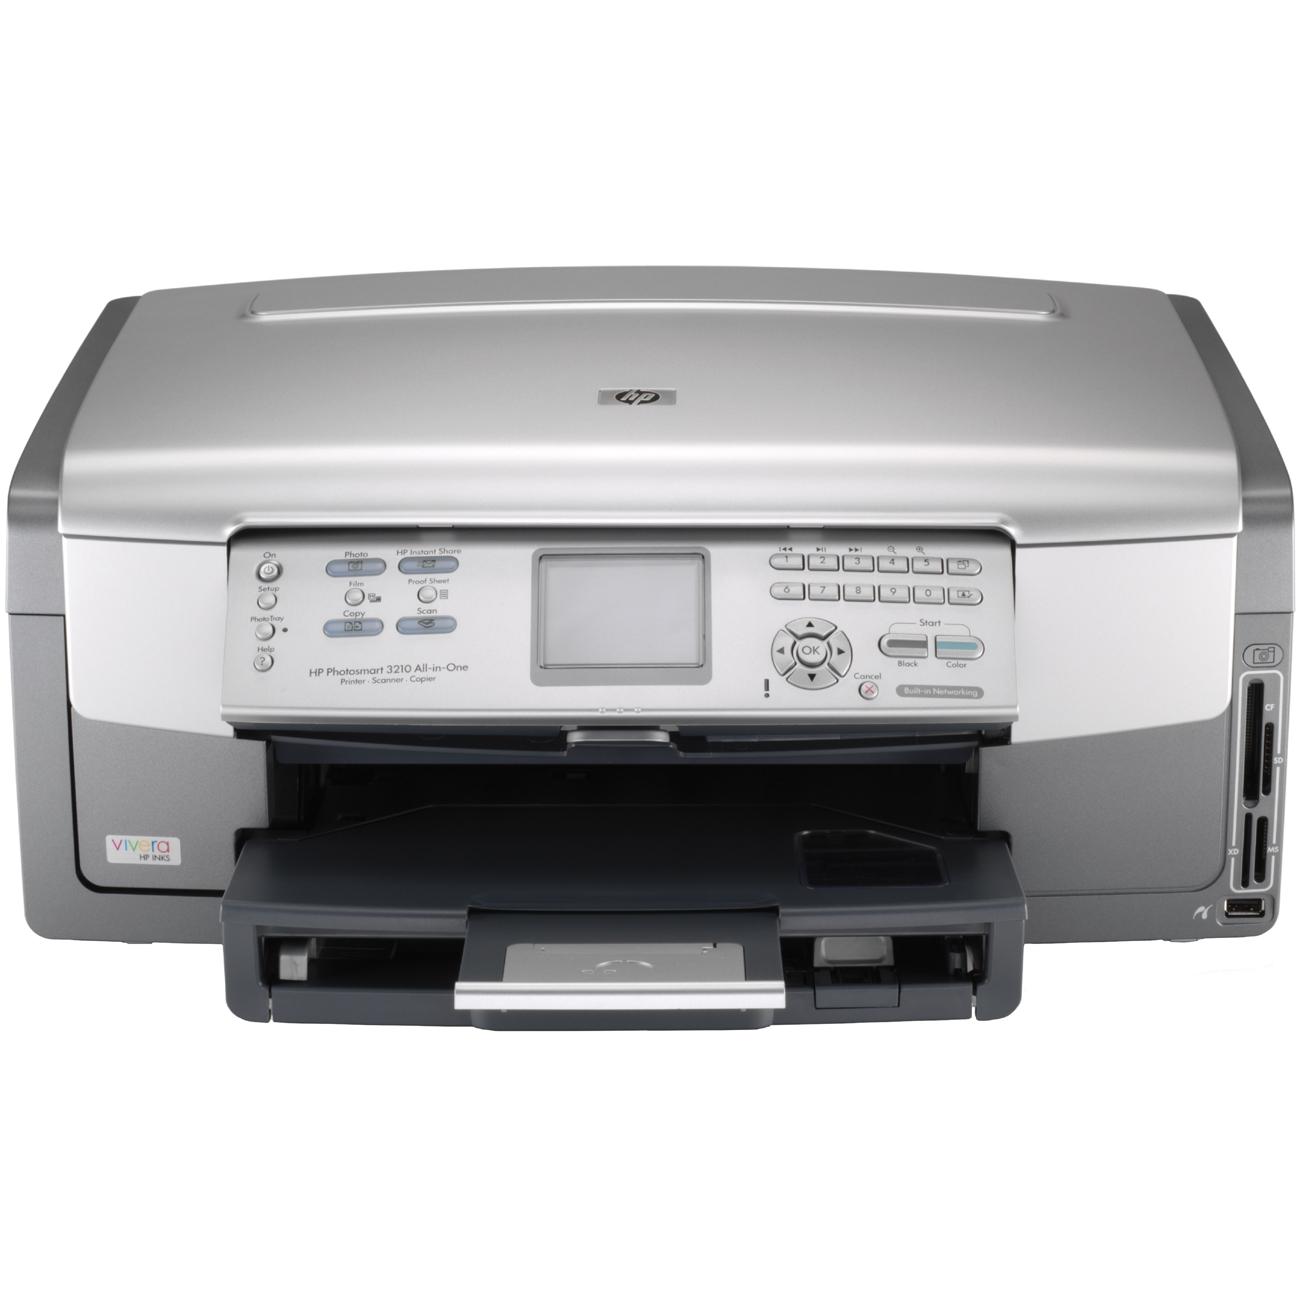 Superwarehouse - HP Photosmart 3210 All in One Inkjet Printer, HP Q5843A#ABA